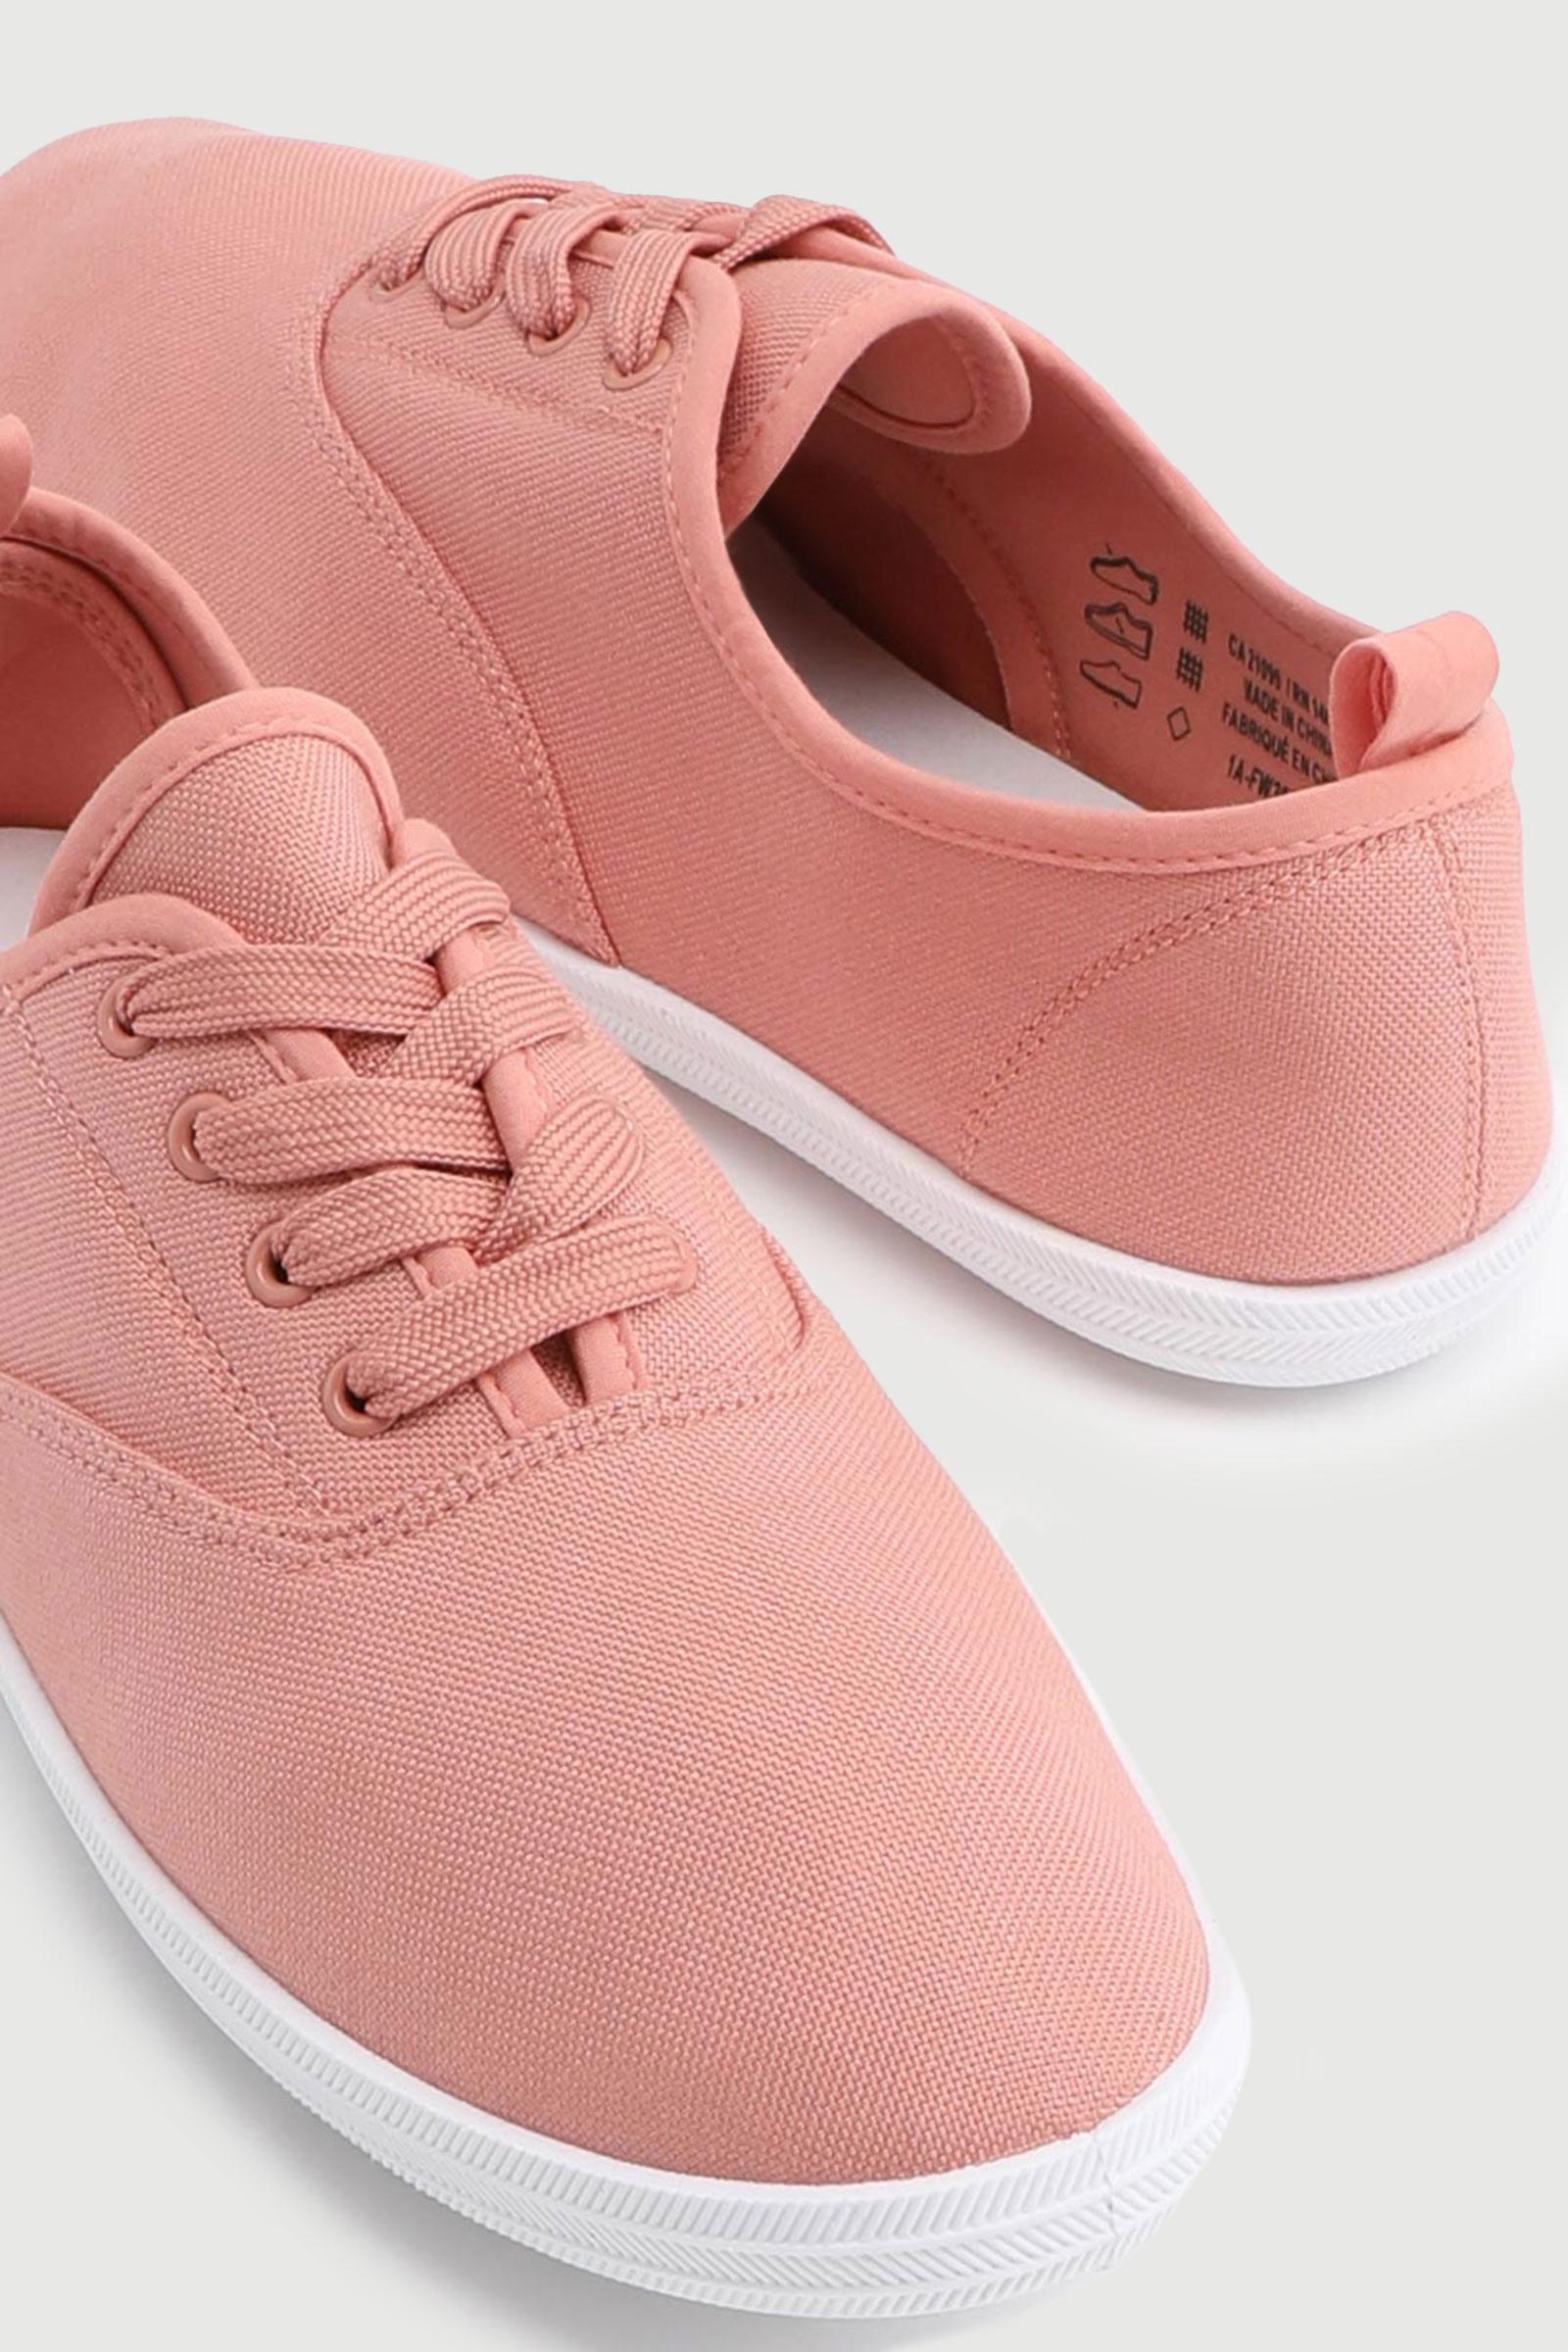 Eco-Conscious Sneakers